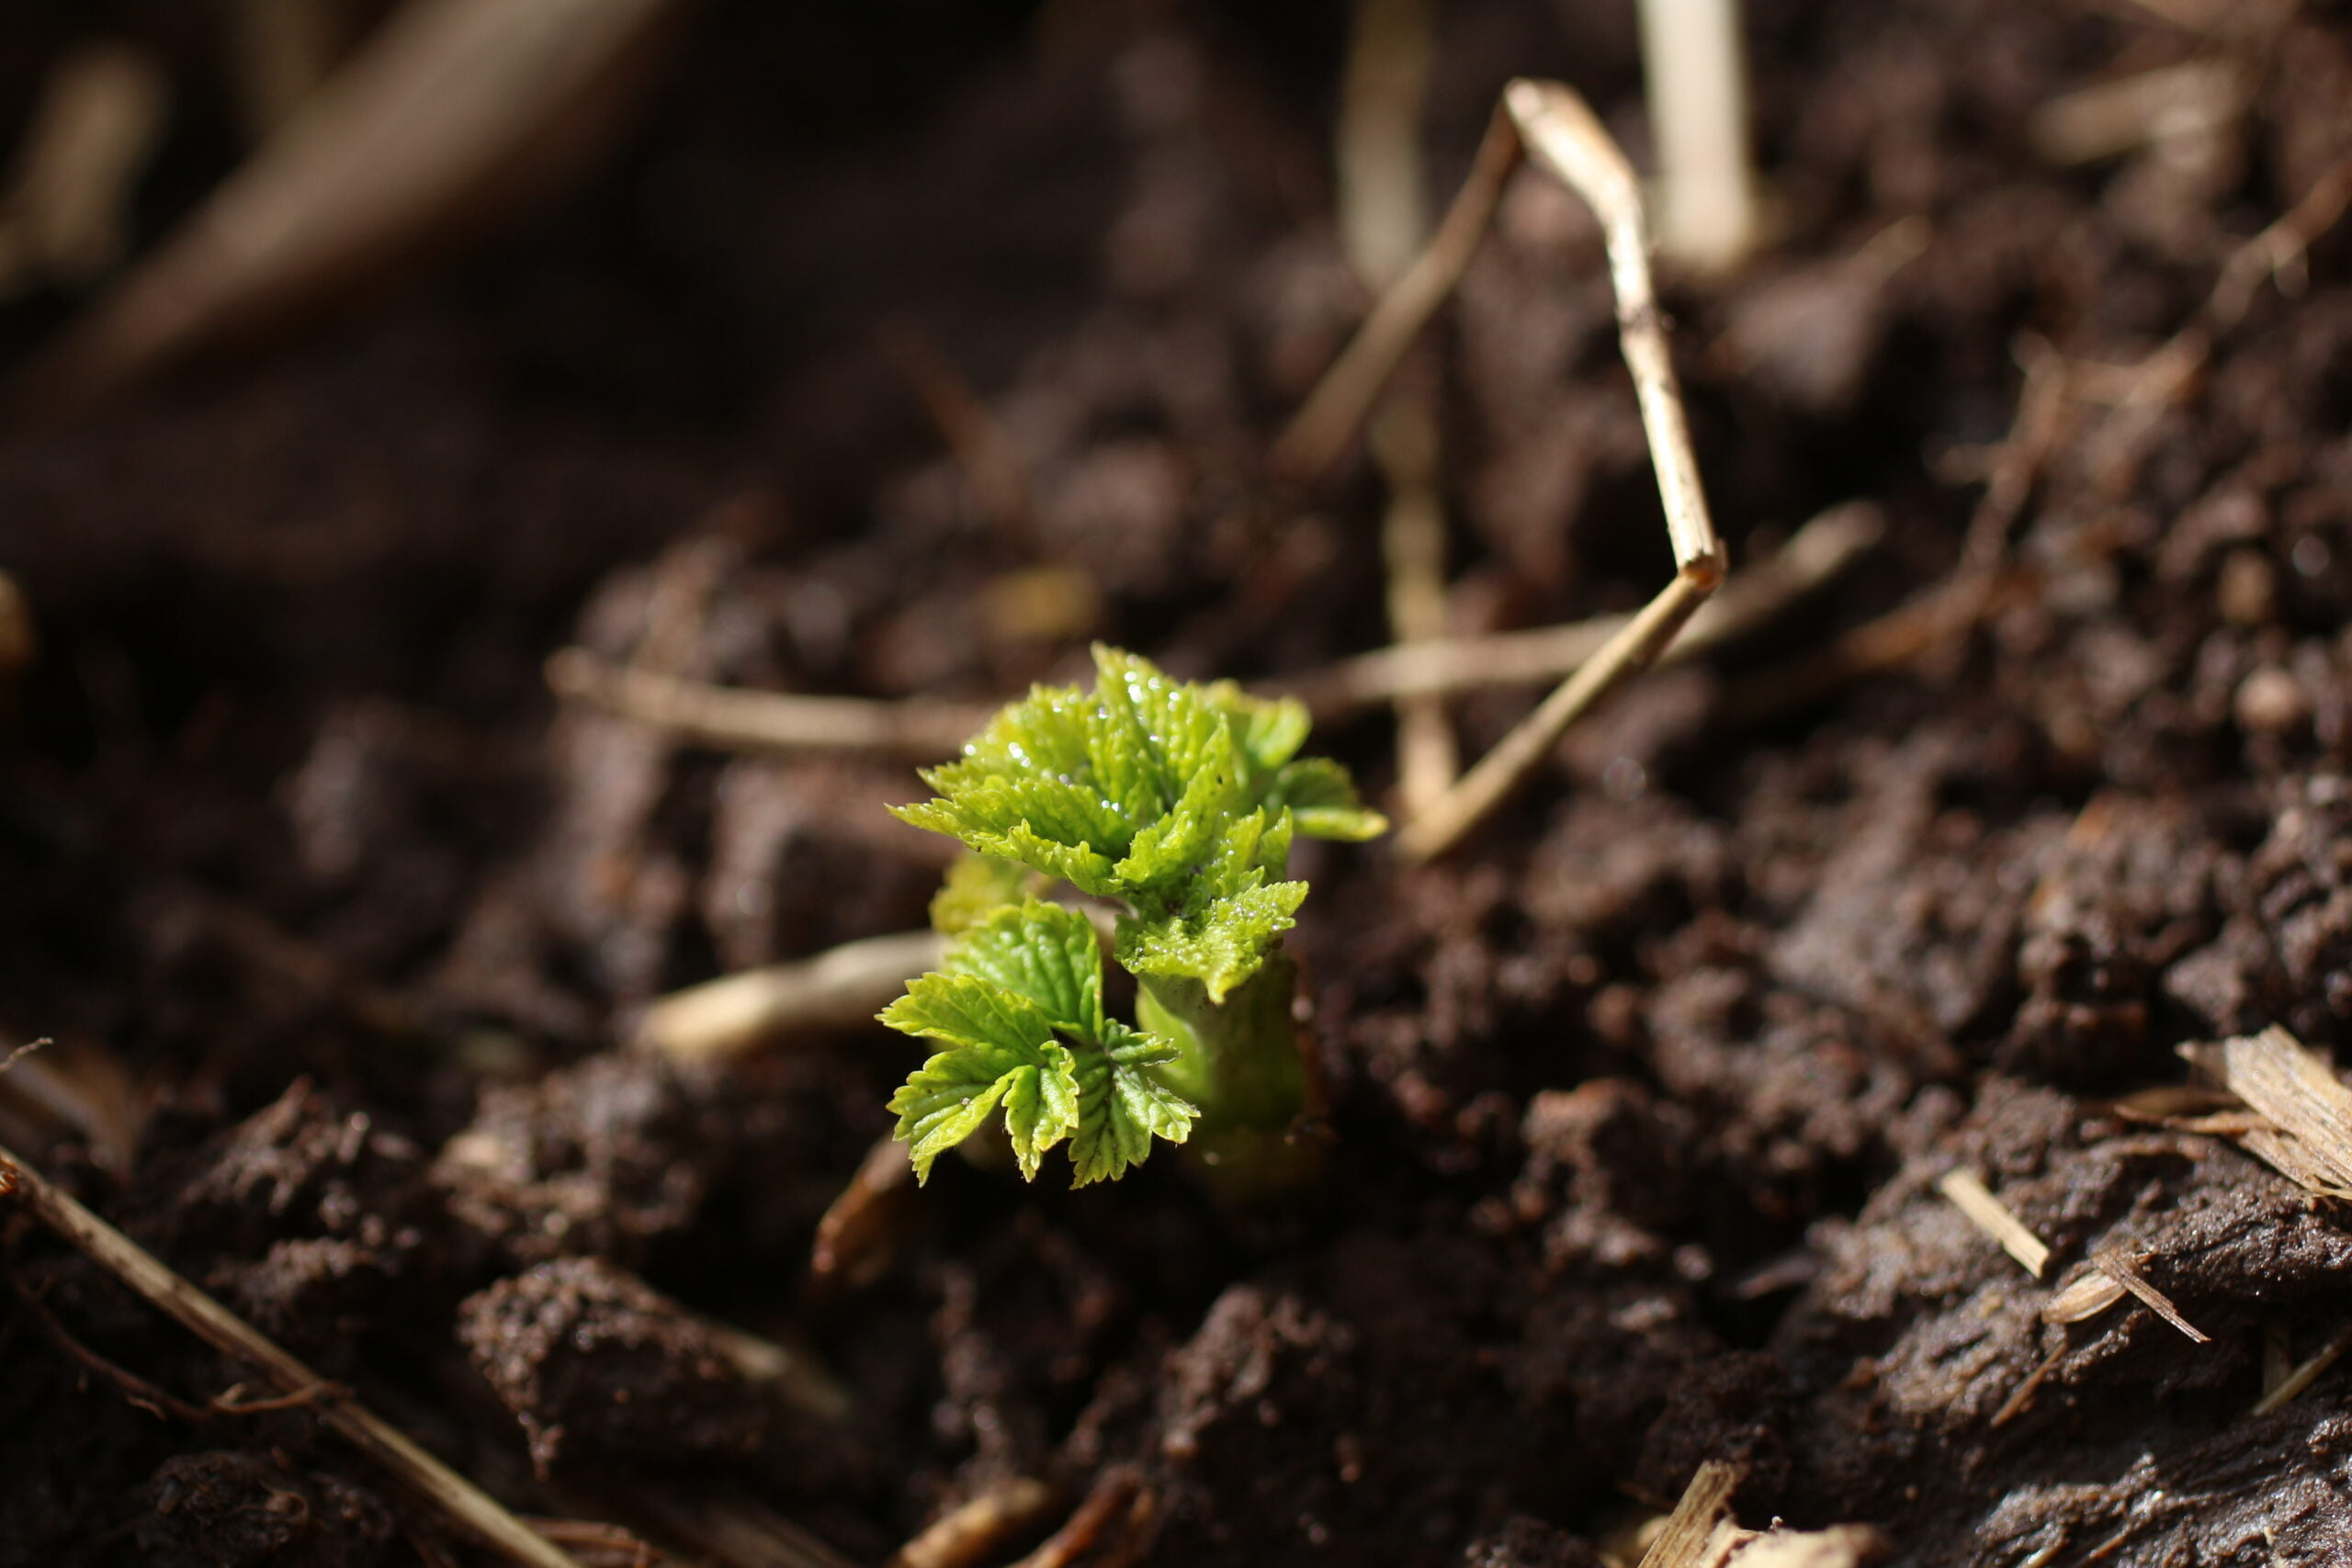 Raspberry seedling